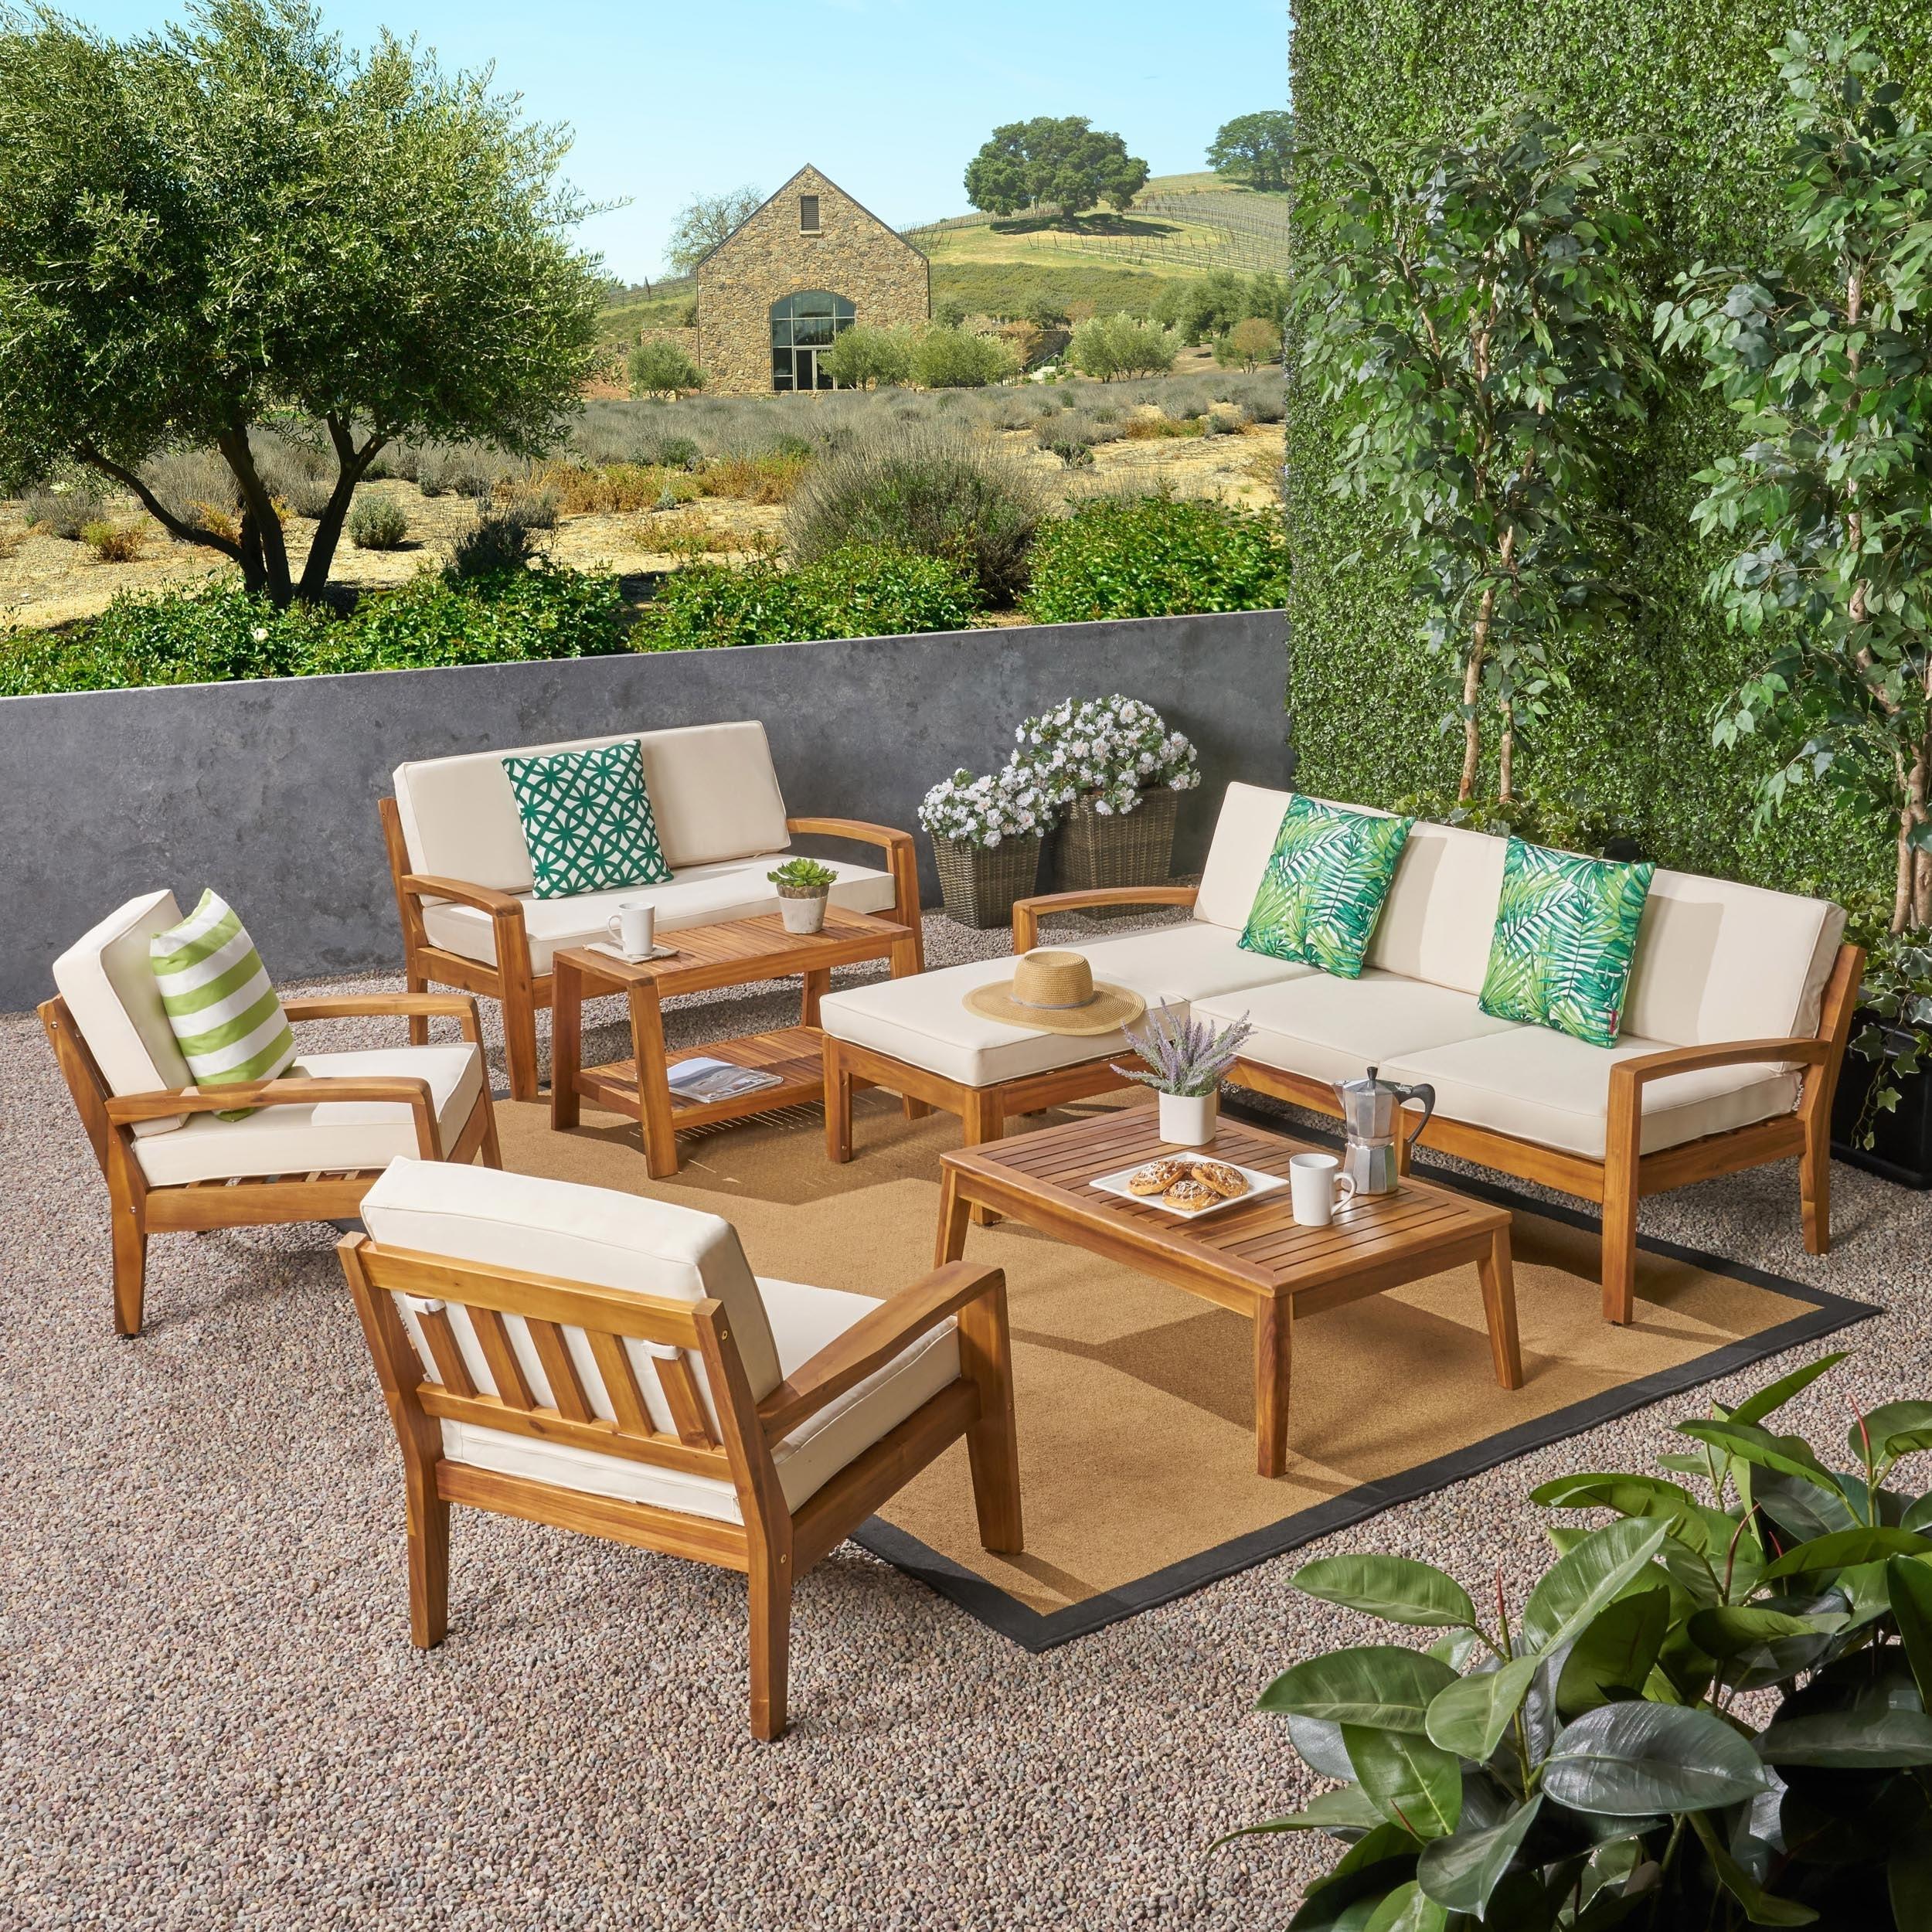 7 Seater Acacia Wood Sectional Sofa Set